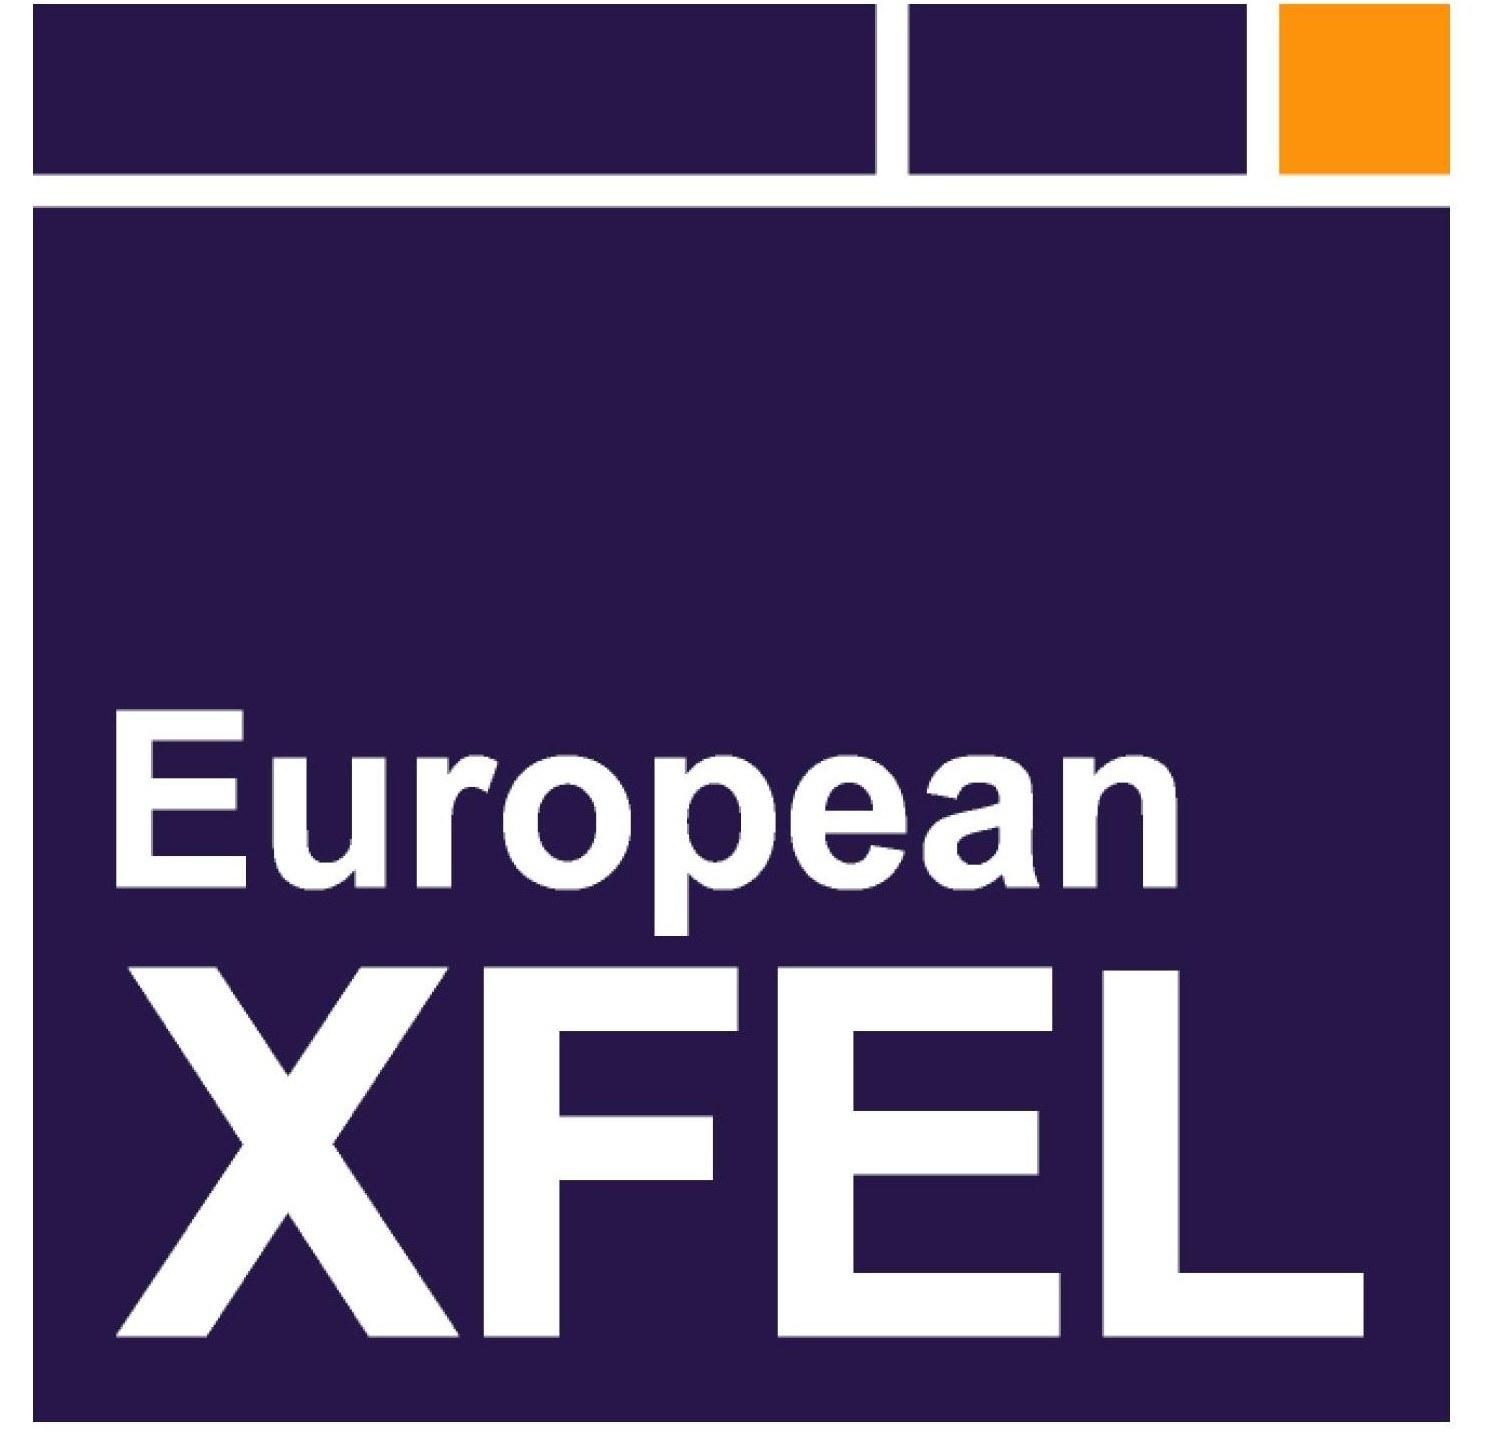 European XFEL   European x ray free electron laser logo [PDF] png